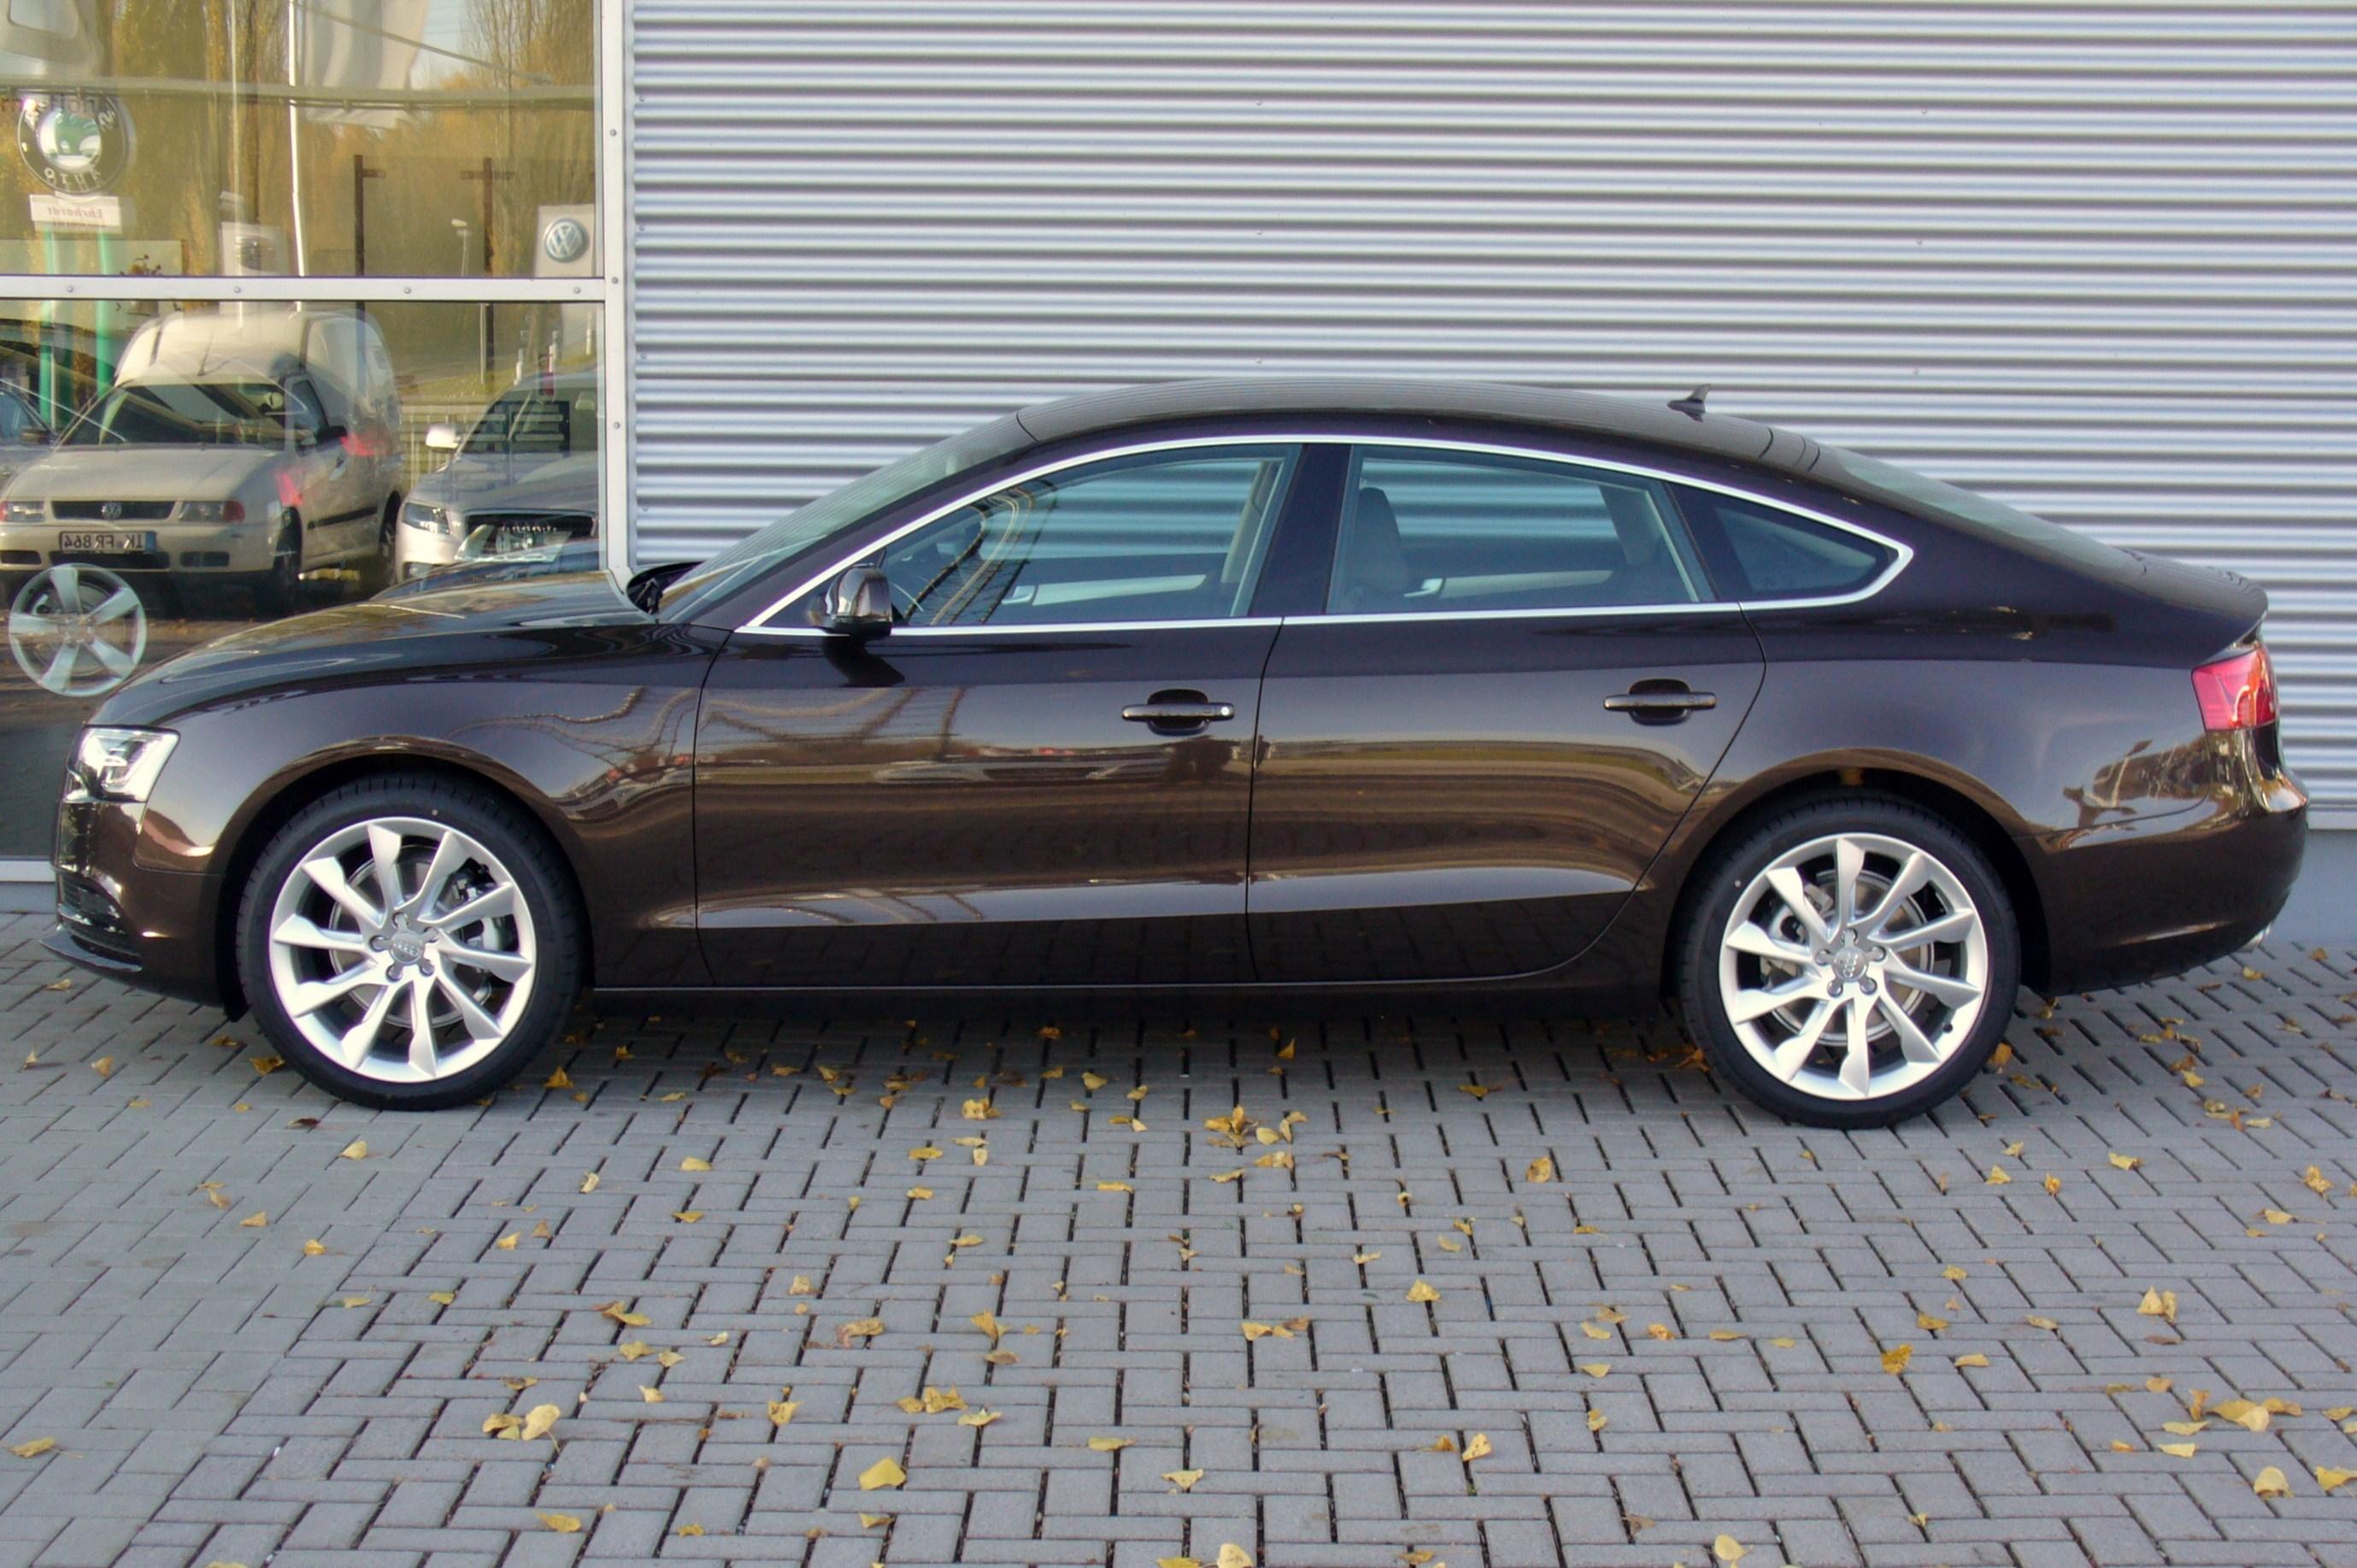 audi a5 sportback 20 tdi teakbraun facelift seitejpg